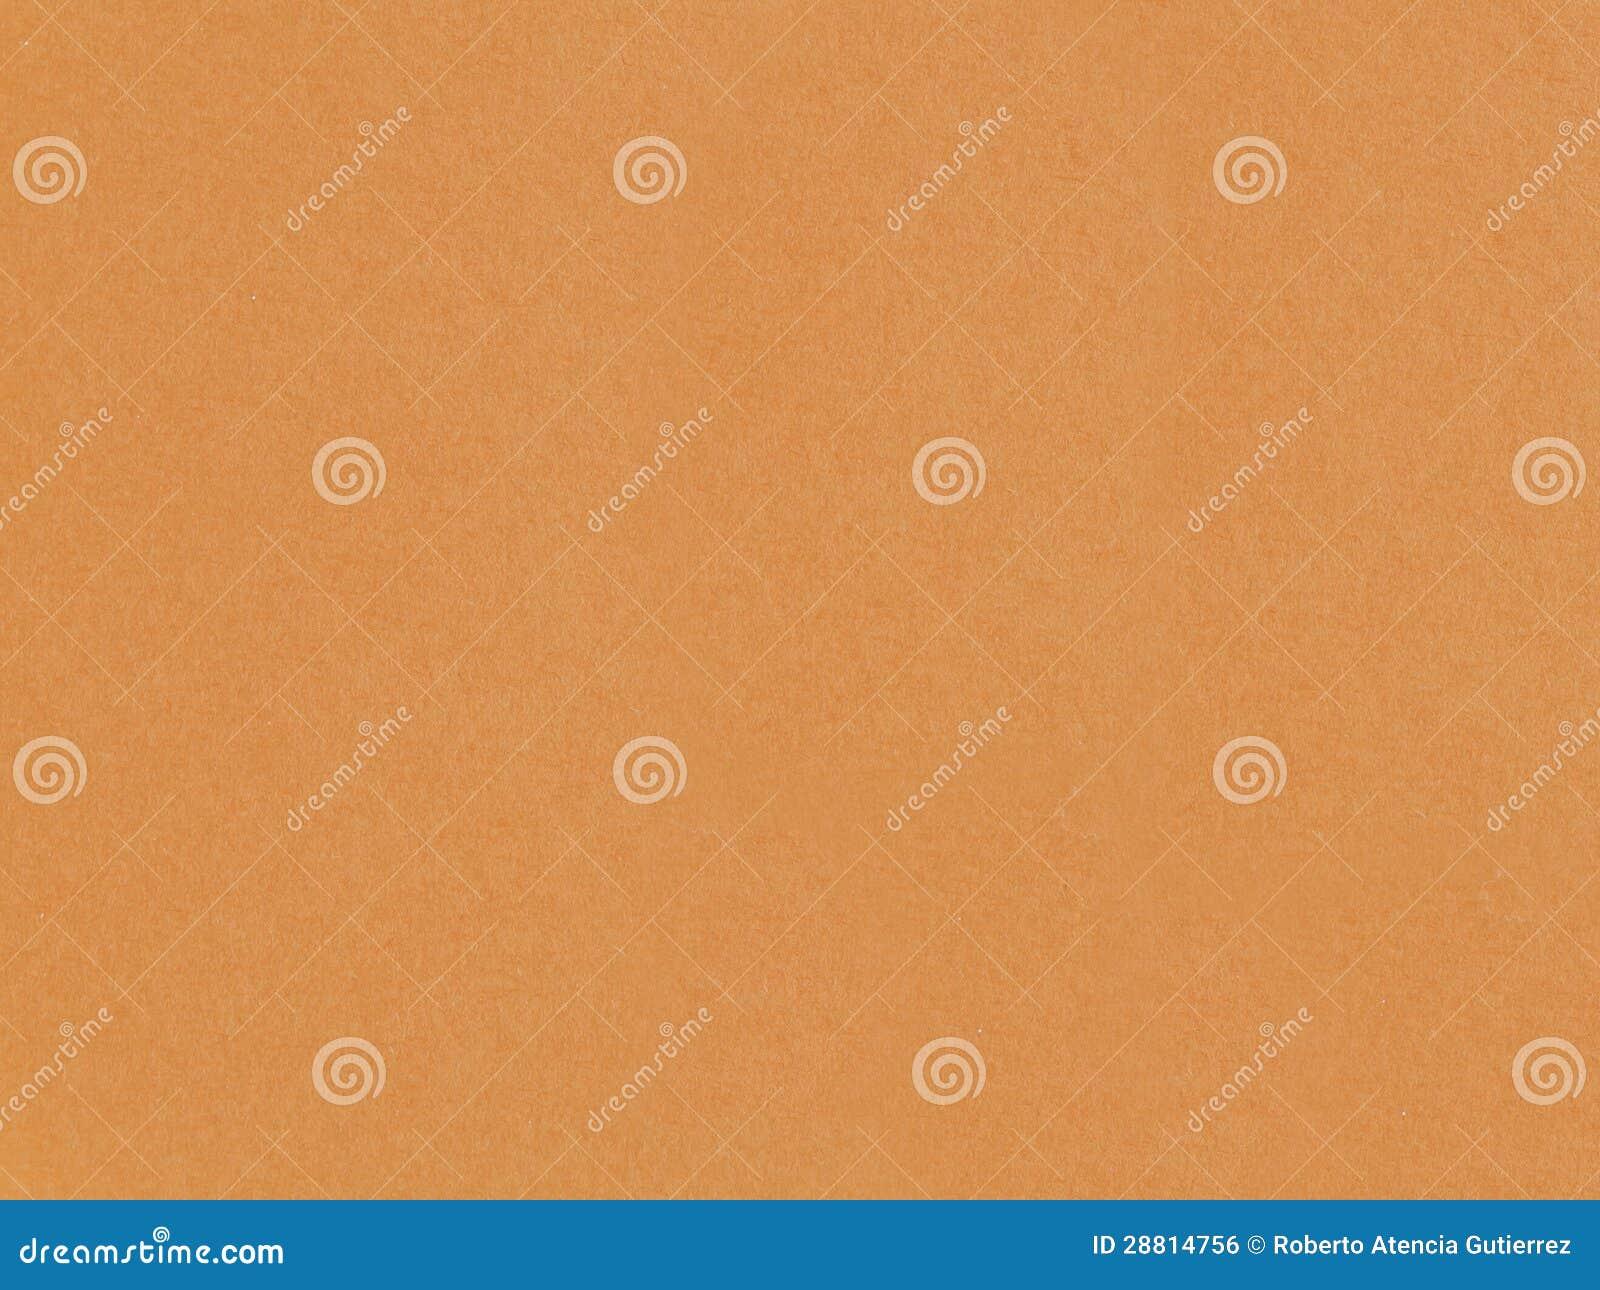 Orange background with burlap texture